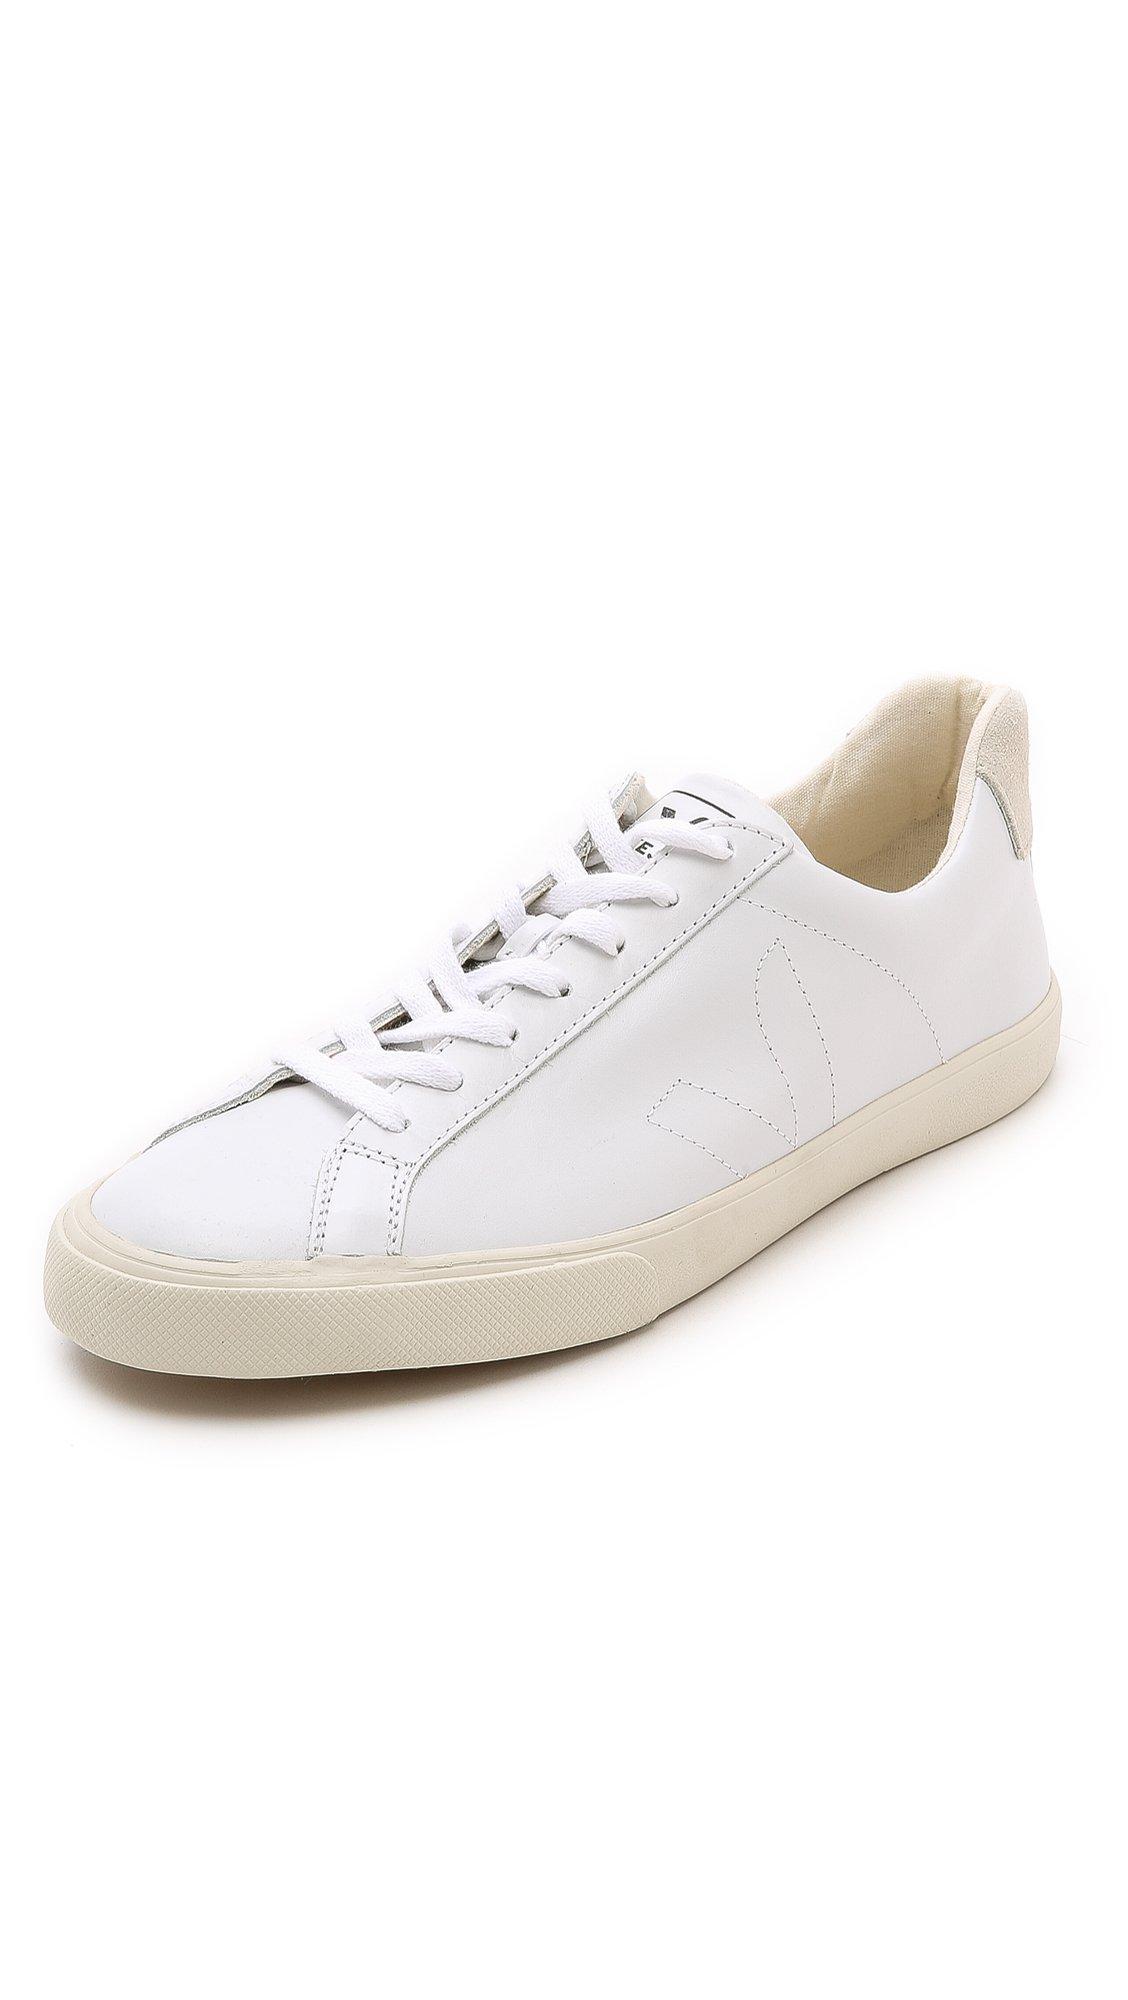 Veja Womens Shoes